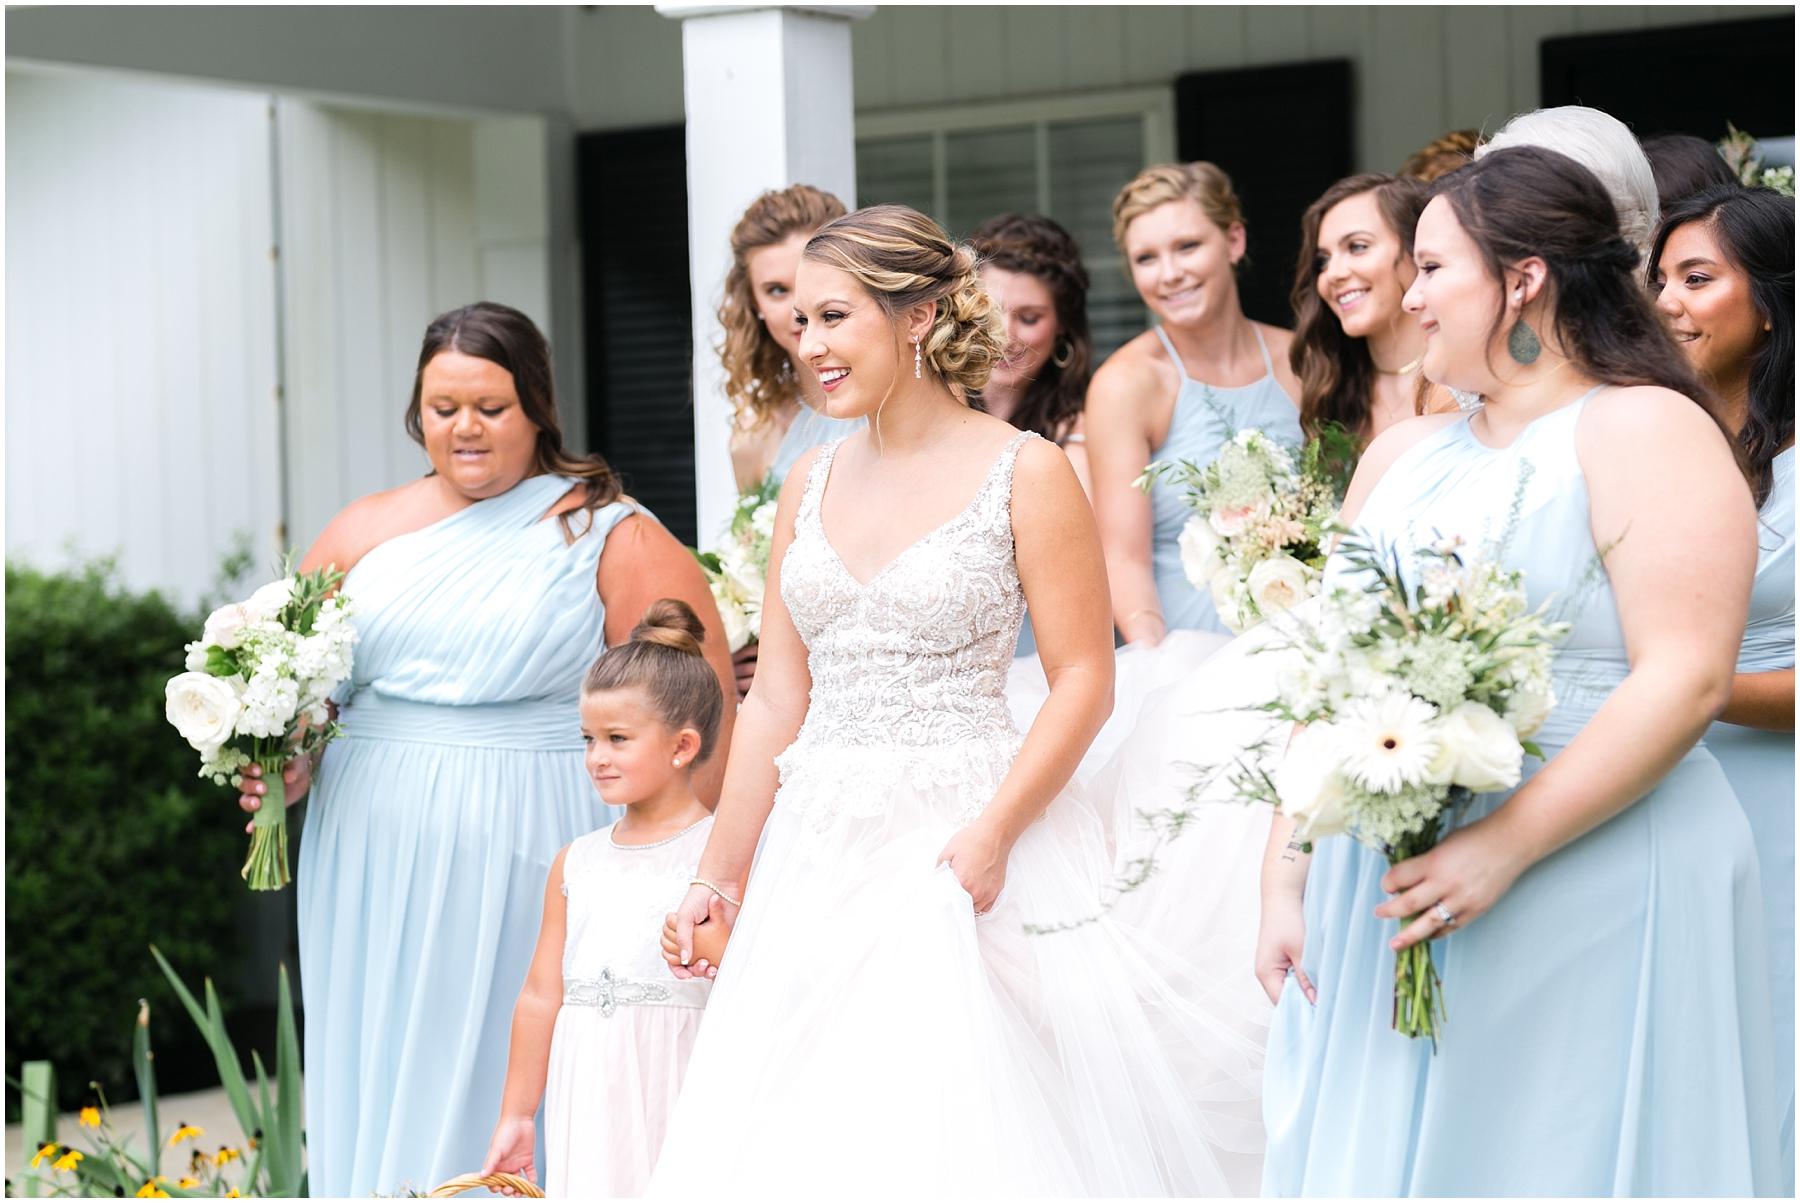 virginia beach wedding photography, bridal party, bridesmaids, here and now bridal wedding dress, jessica ryan photography, jessica ryan photographer